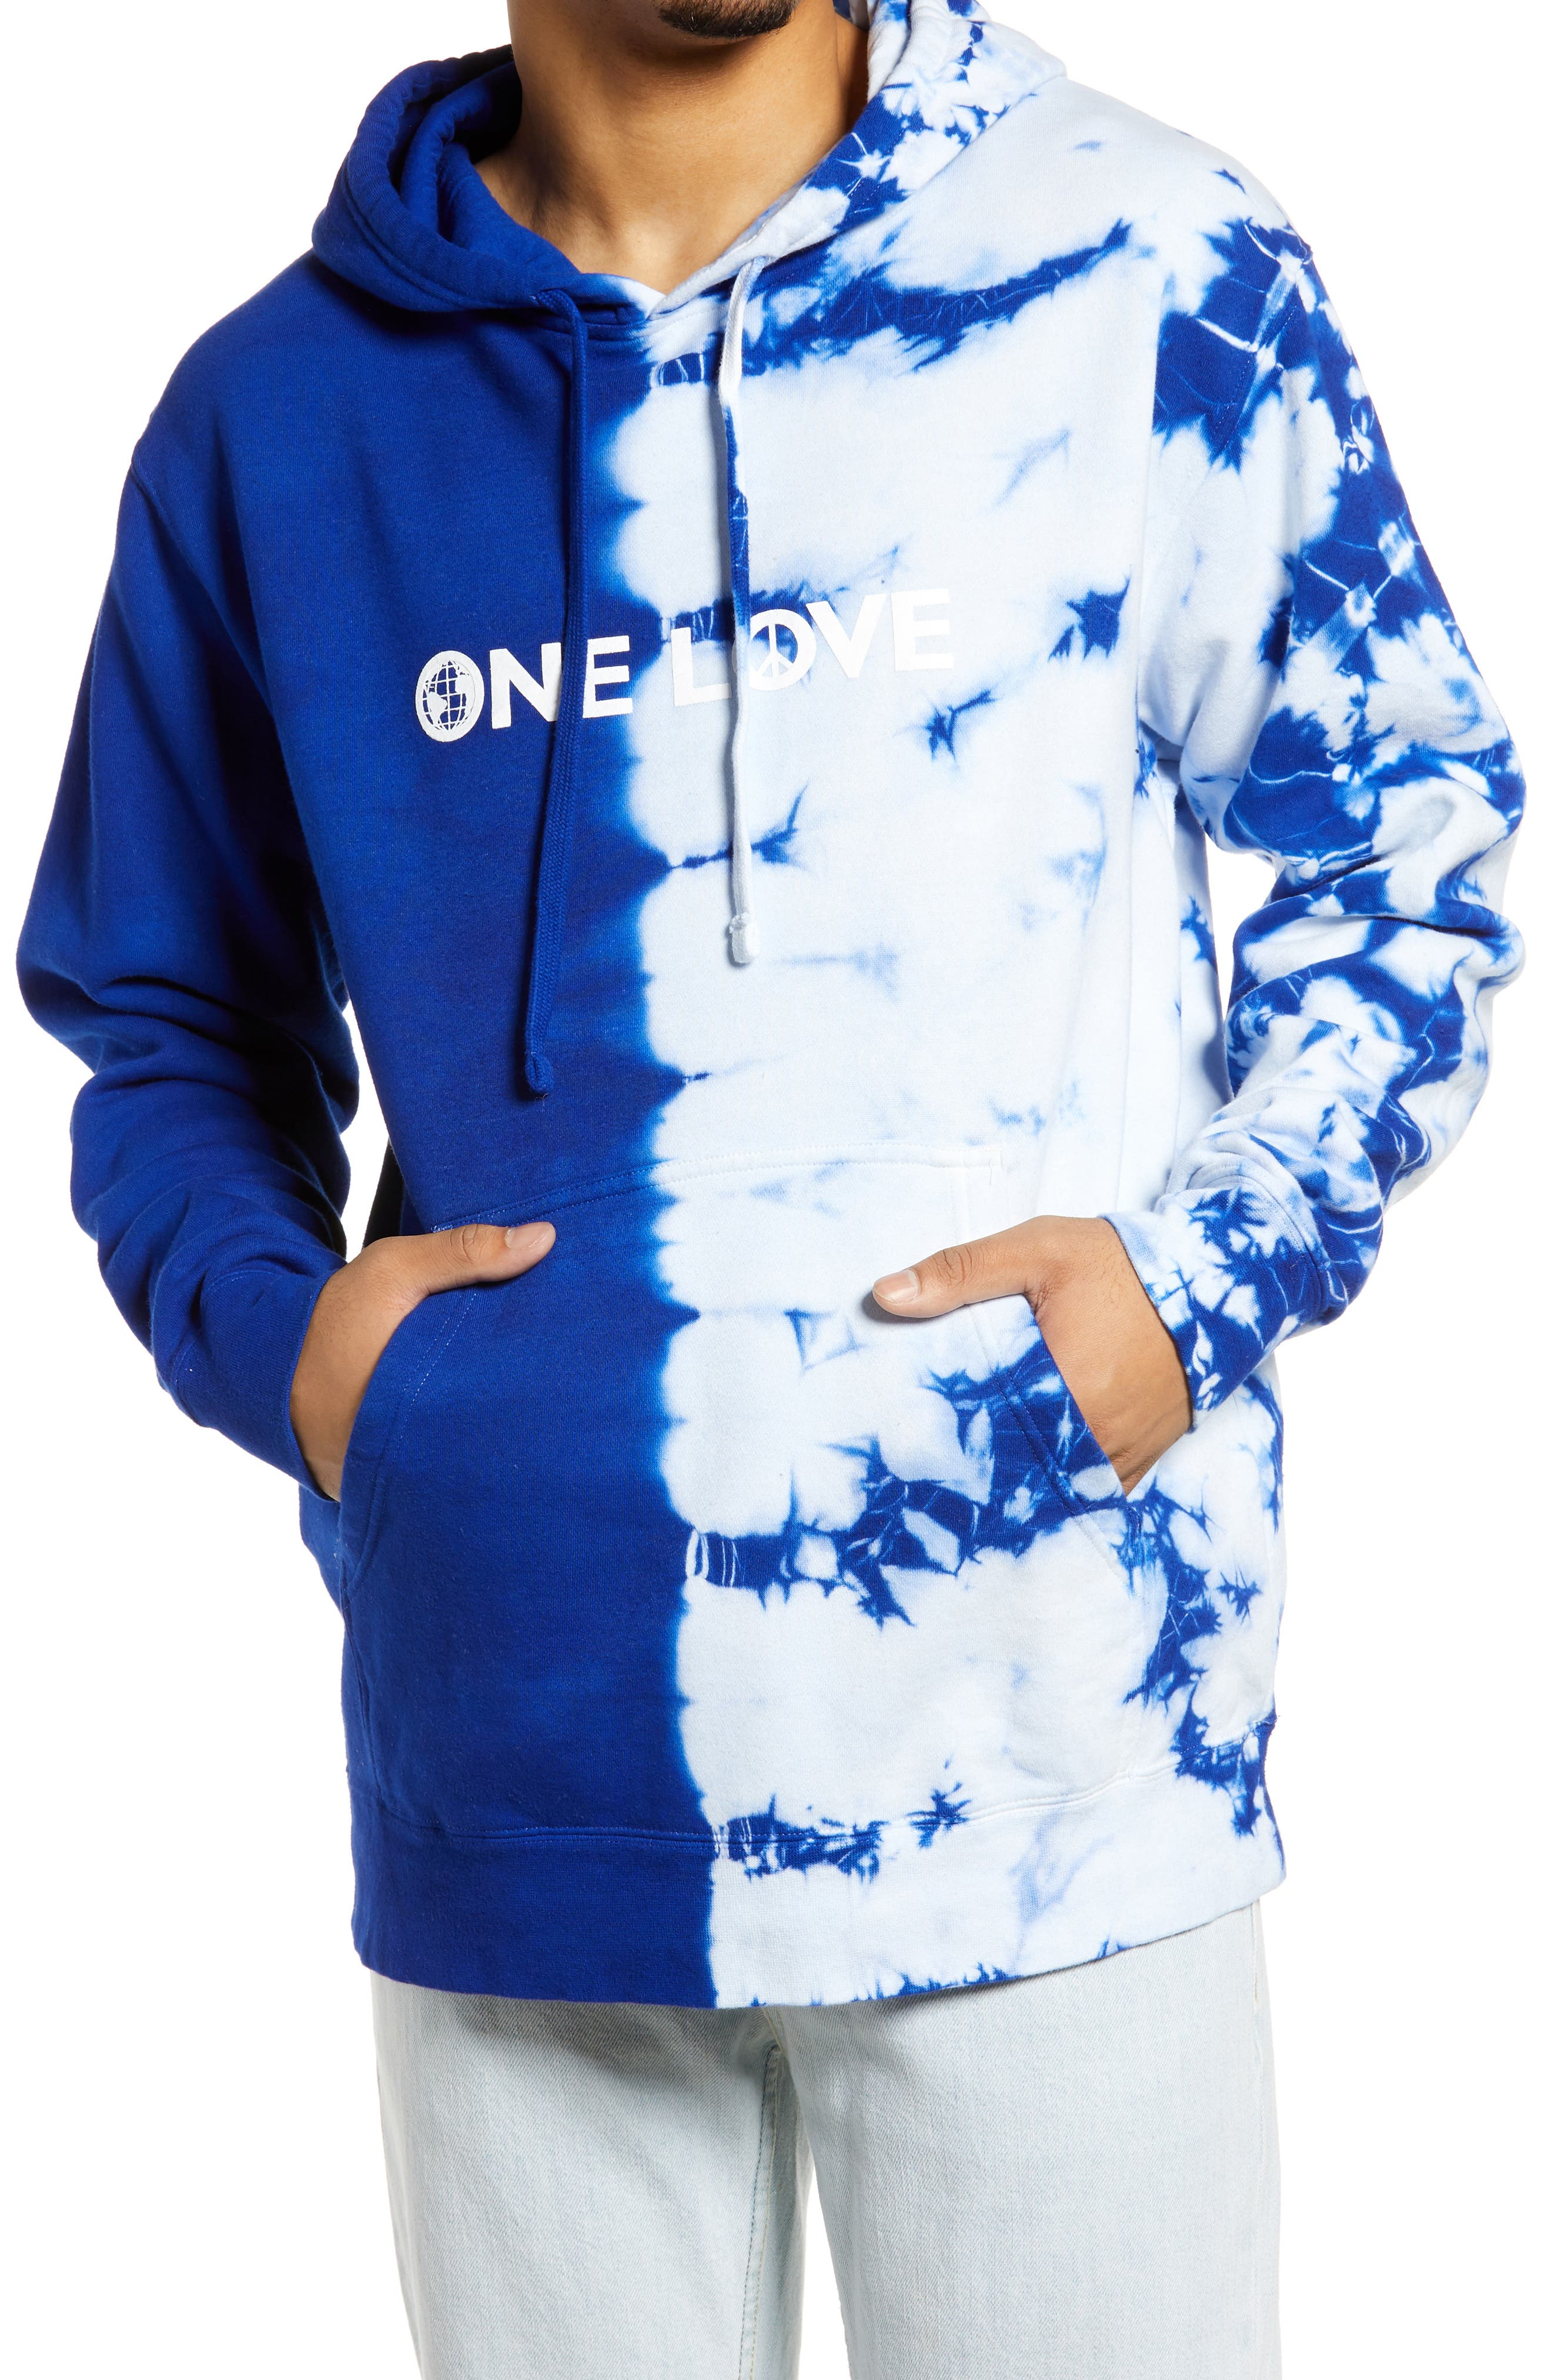 One Love Tie Dye Hooded Sweatshirt